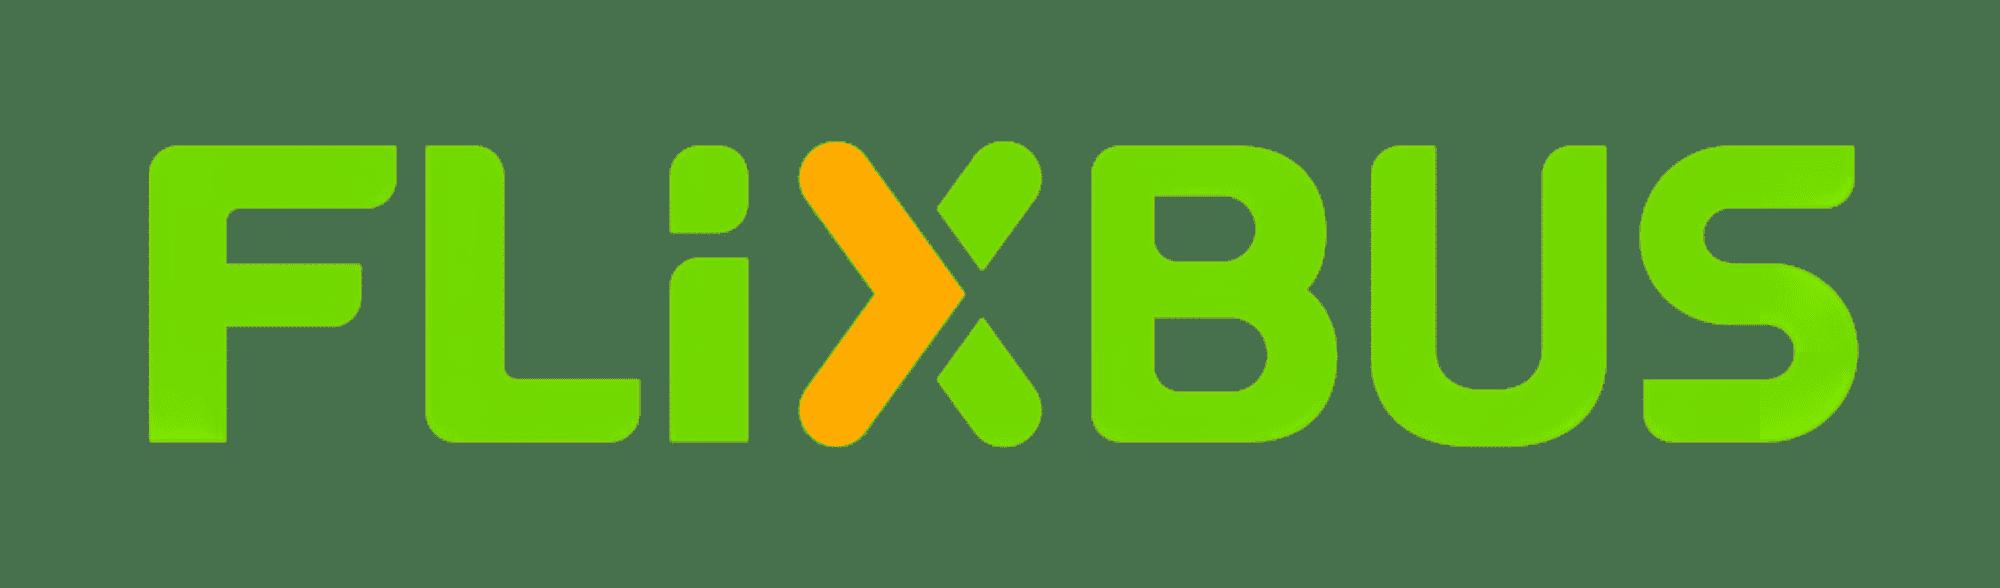 Flixbus test avis logo